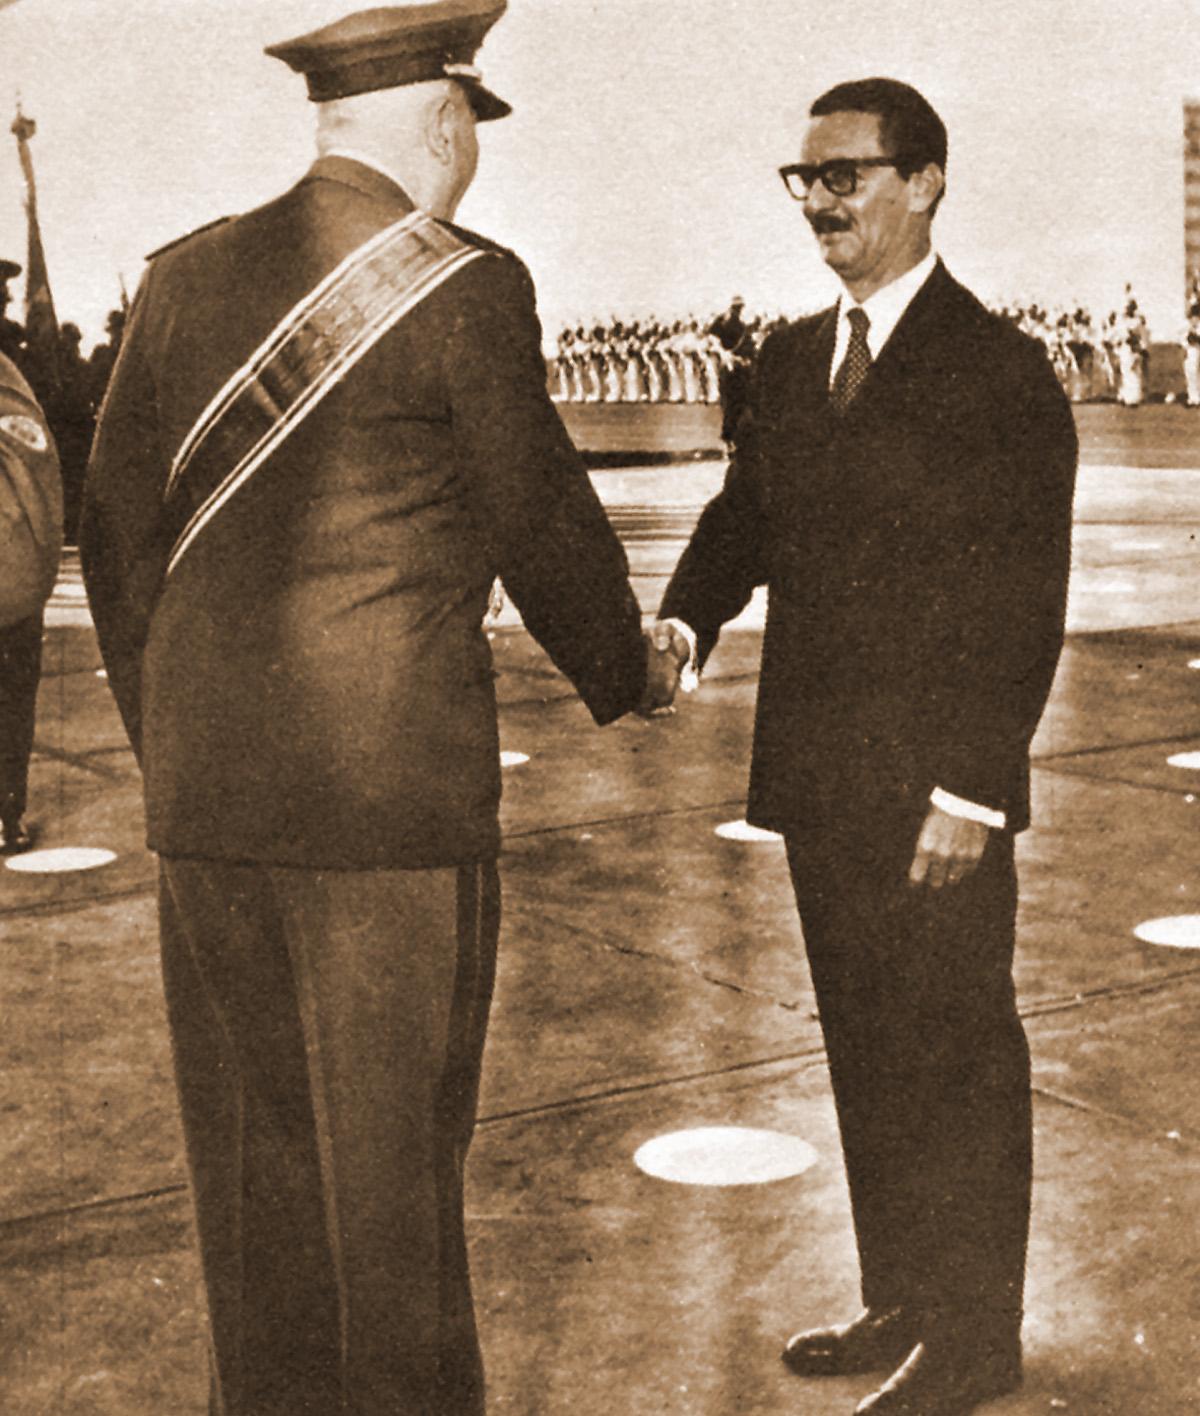 Jânio Quadros cumprimenta Ministro da Guerra<a style='float:right' href='https://www3.al.sp.gov.br/repositorio/noticia/08-2011/J-JaniocomMindaGuerra.jpg' target=_blank><img src='/_img/material-file-download-white.png' width='14px' alt='Clique para baixar a imagem'></a>